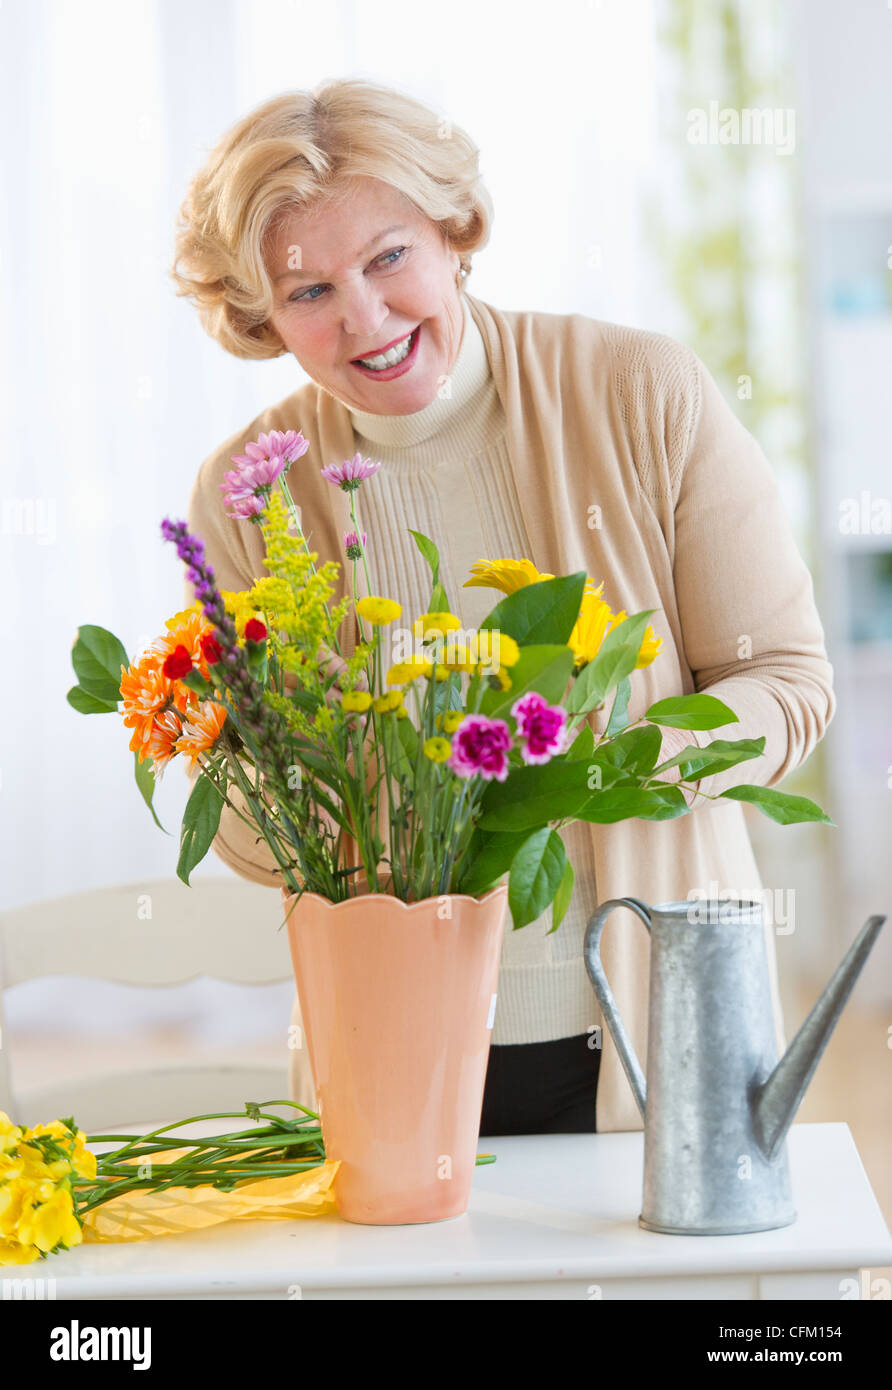 USA, New Jersey, Jersey City, Smiling senior woman arranging flowers Stock Photo